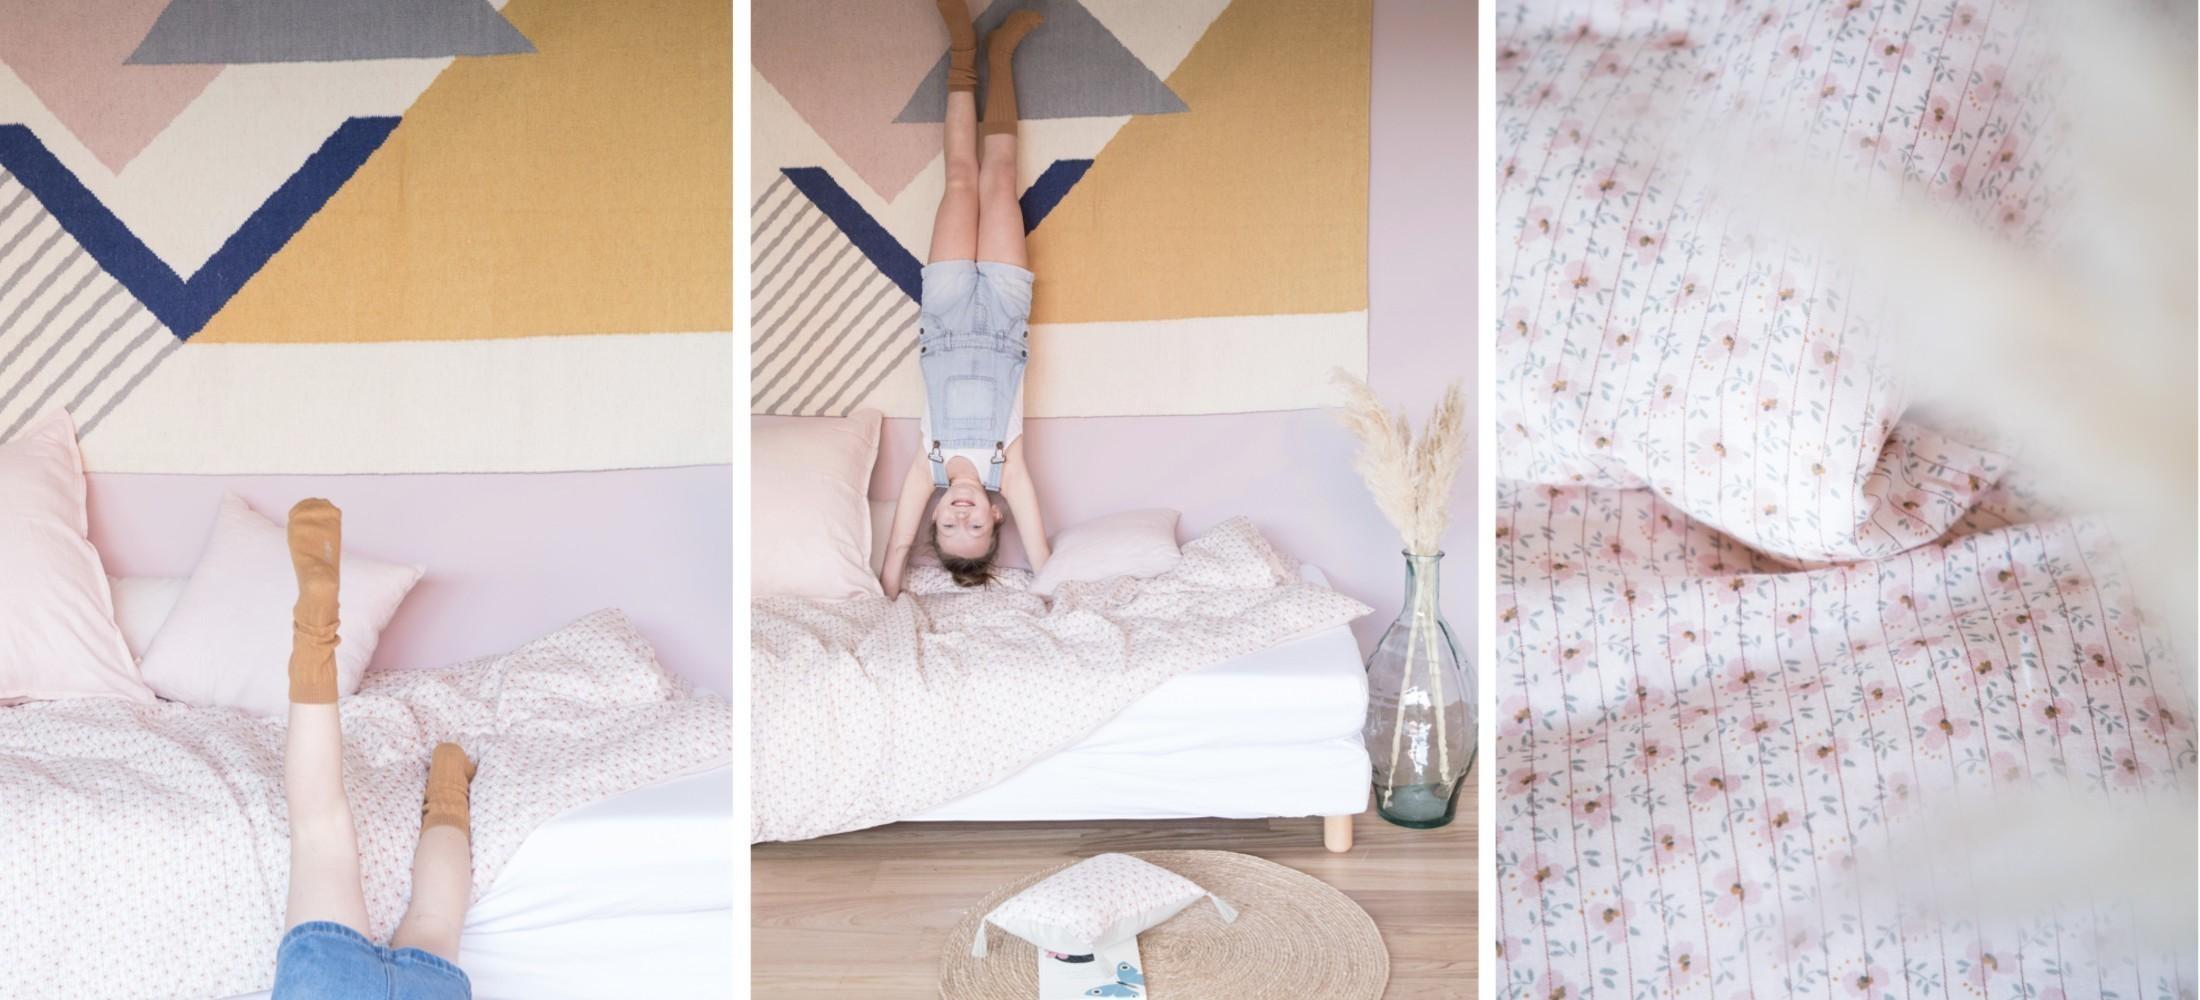 NEW IN nomade linge de lit coussin accessoires kids enfant